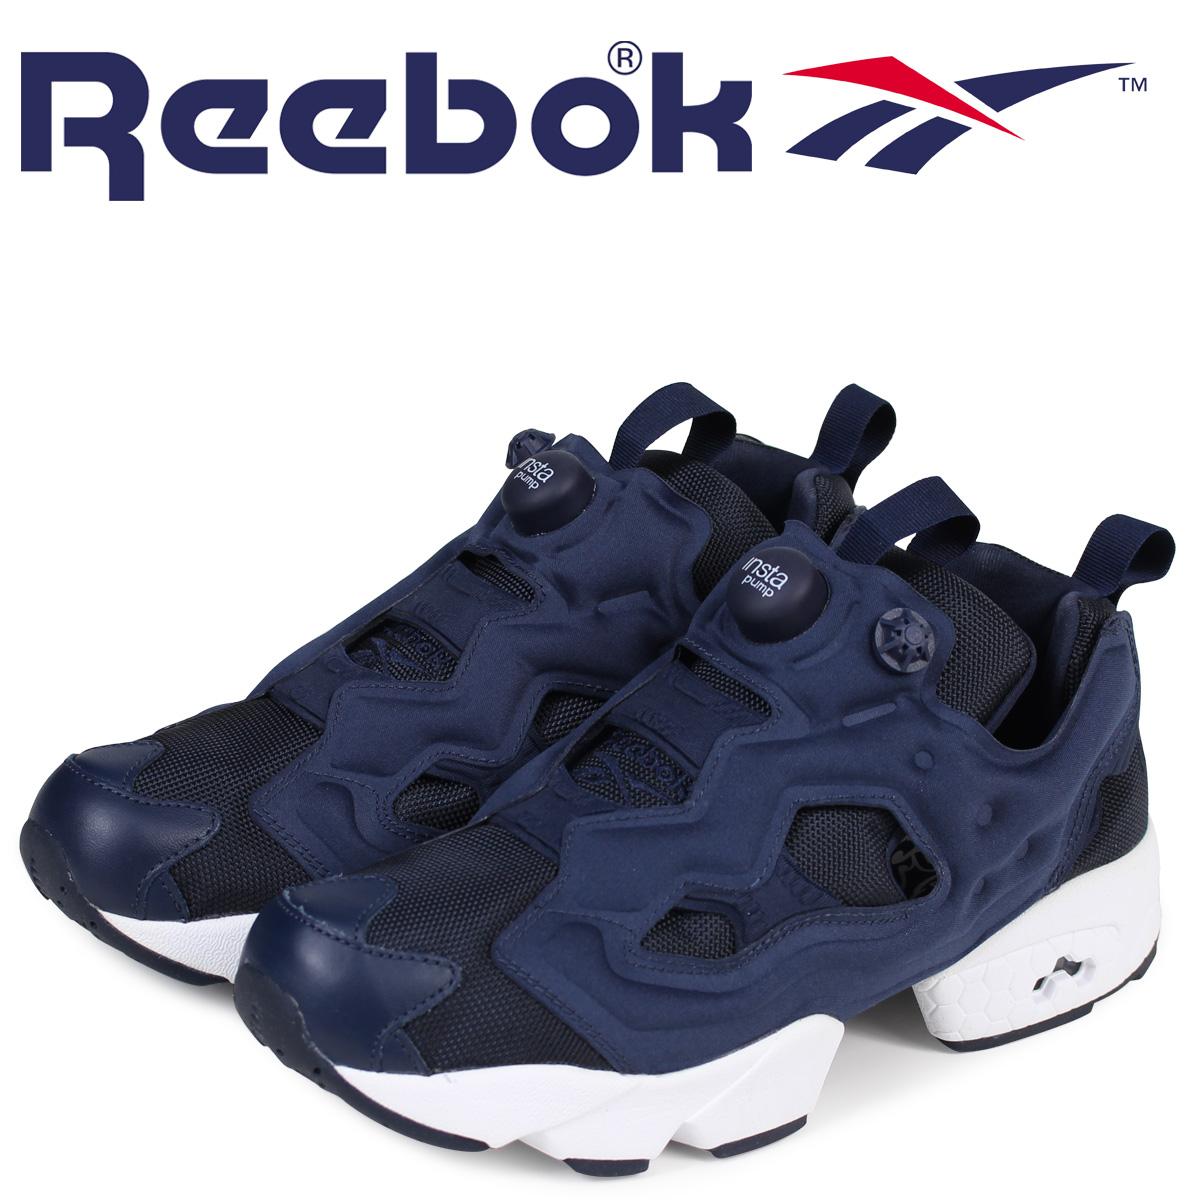 Reebok リーボック ポンプフューリー スニーカー スニーカー INSTAPUMP FURY FURY OG V65752 メンズ メンズ レディース 靴 ネイビー, セタナチョウ:6bcb2fee --- jpscnotes.in